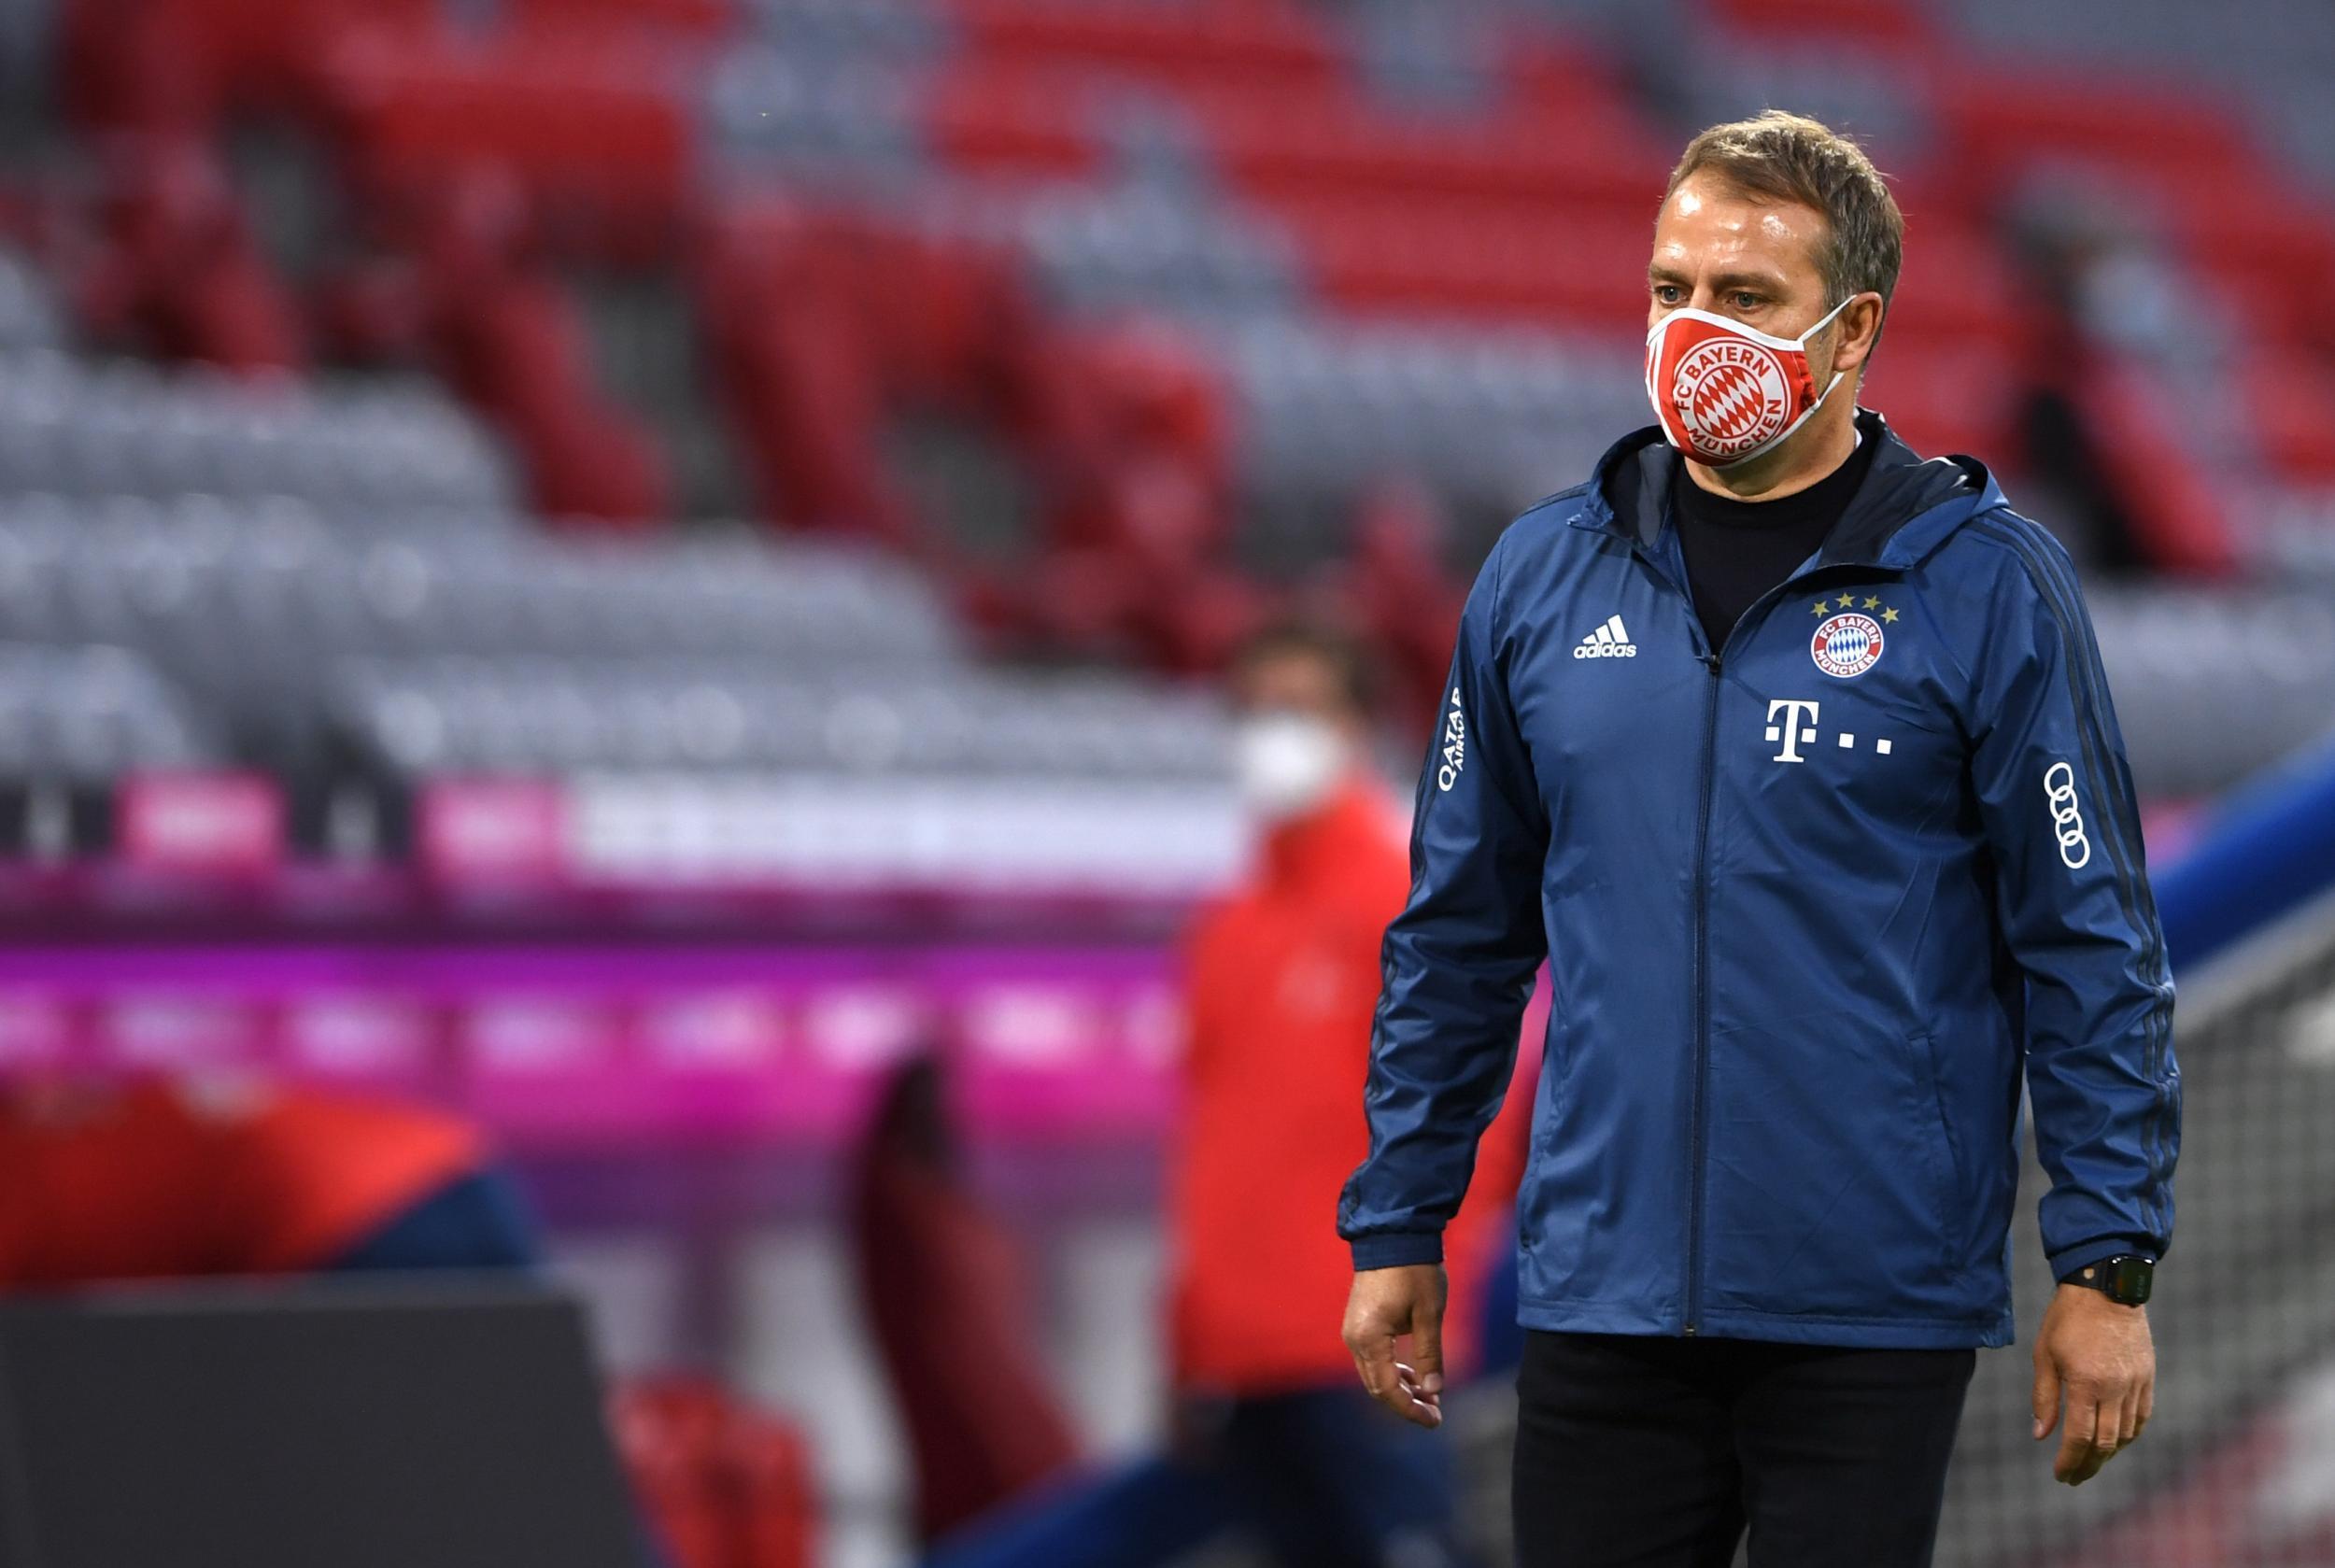 Bundesliga: Hans-Dieter Flick hails relentless Bayern Munich after another thumping win